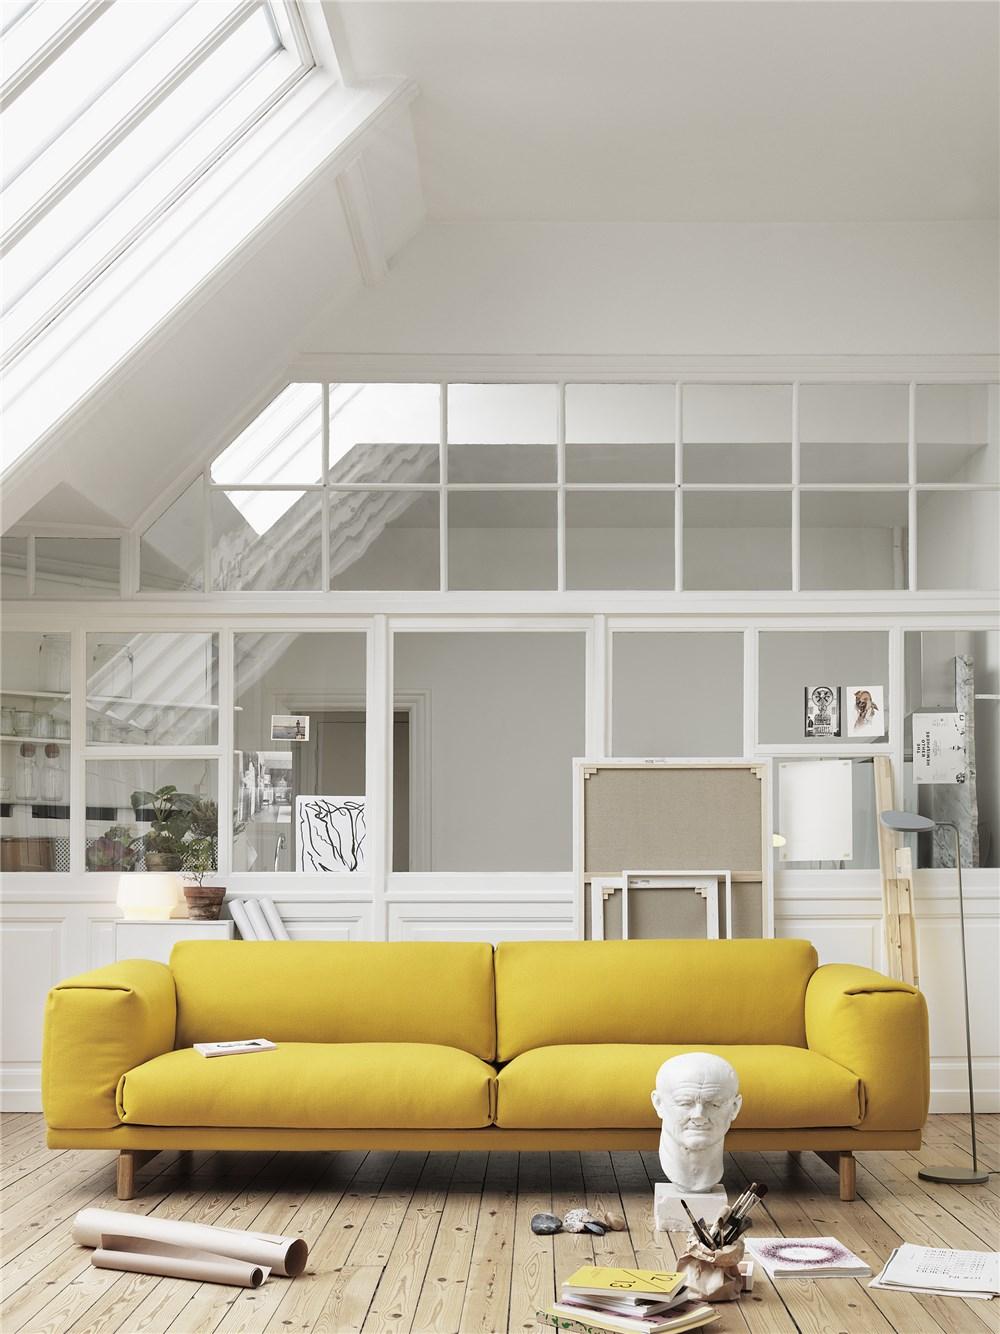 Rest_Yellow_Hallingdal 457_Leaf Floor Lamp_(150).jpg